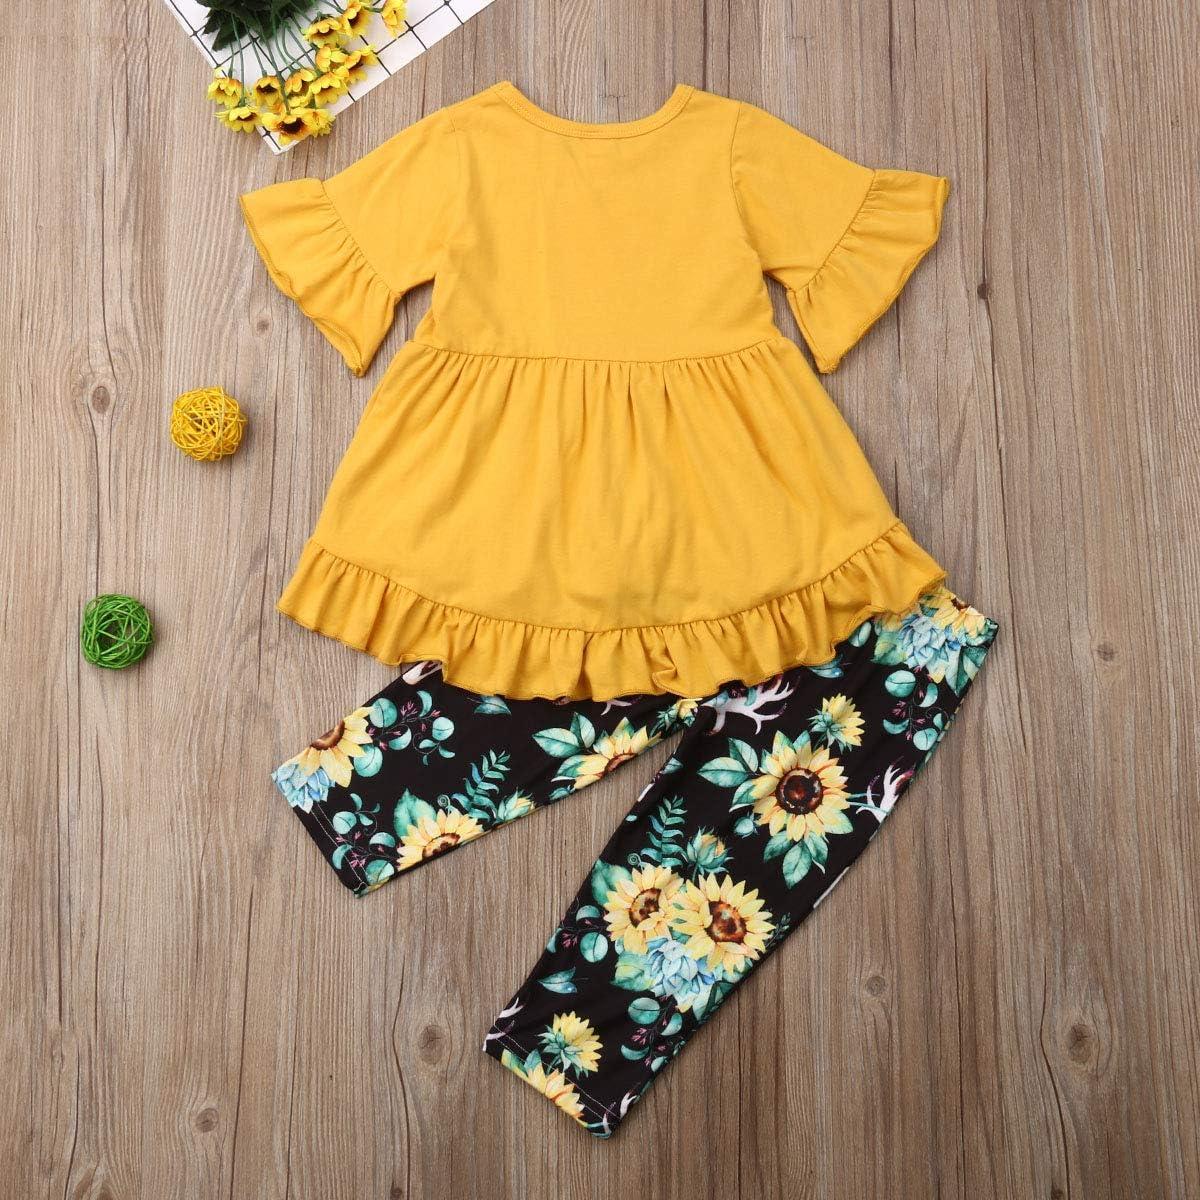 Toddler Girl Clothes Flare Sleeve Yellow Deer Shirt Top Ruffle Dress Sunflower Long Pants Leggings Outfit Set